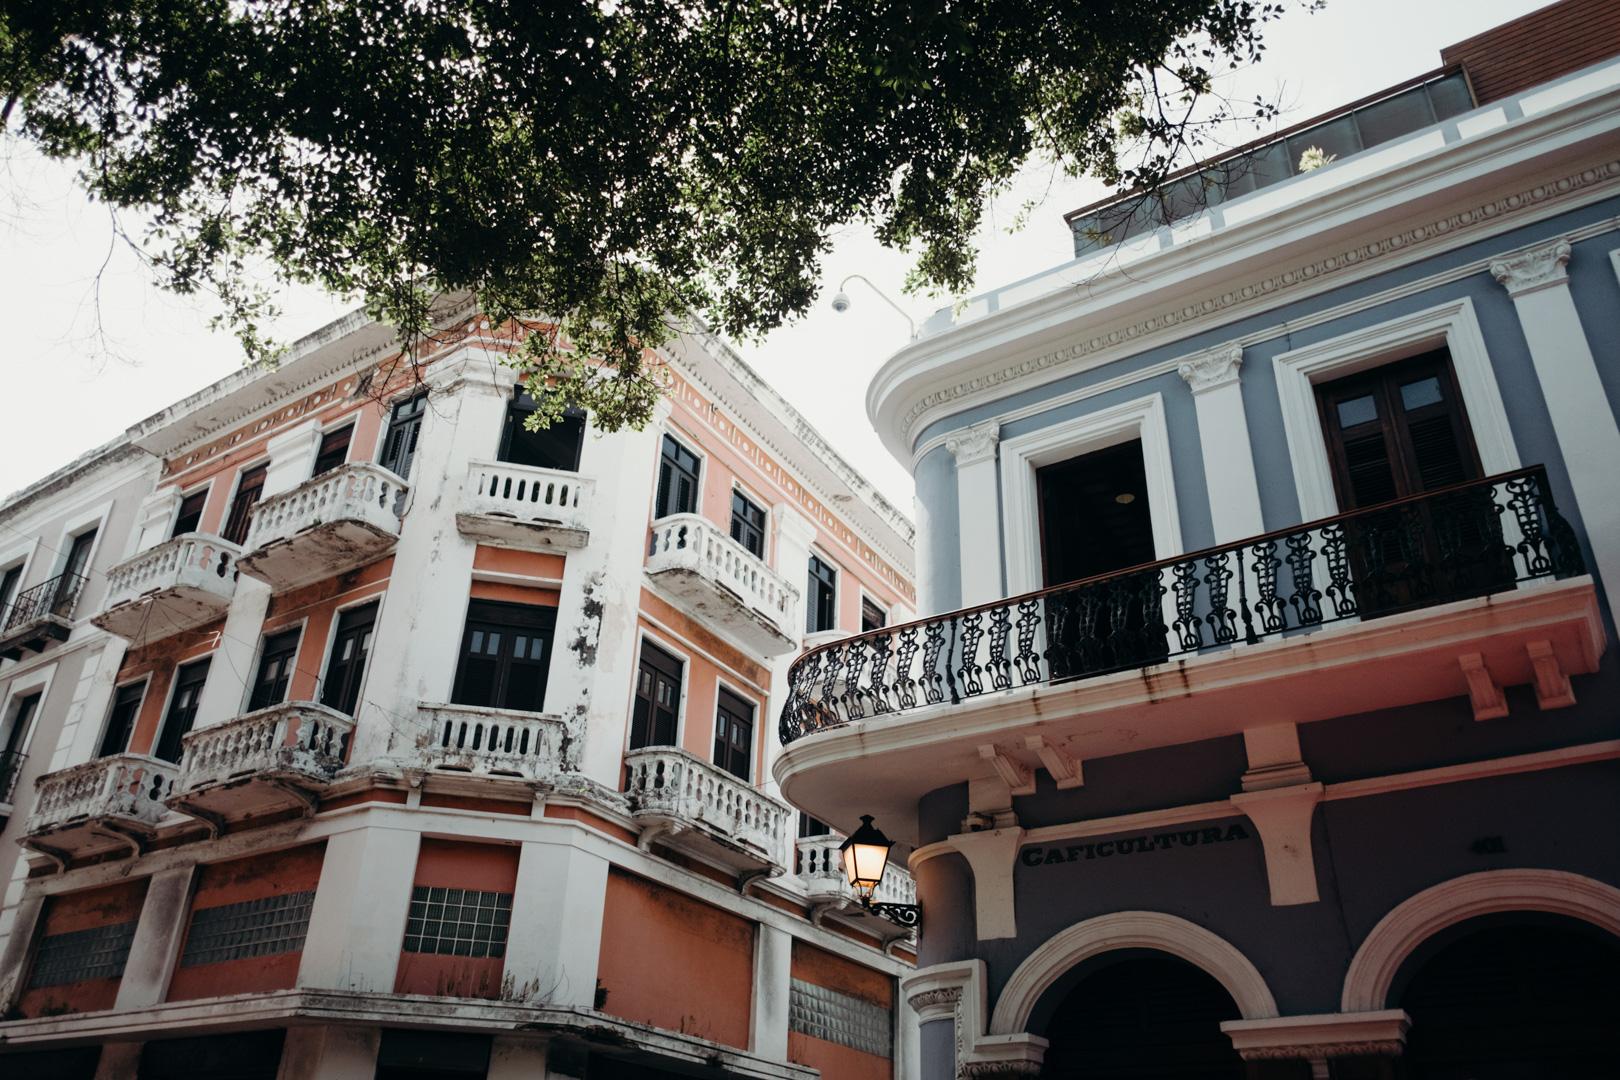 20170720_Puerto_Rico_Guide_Websize-48.jpg